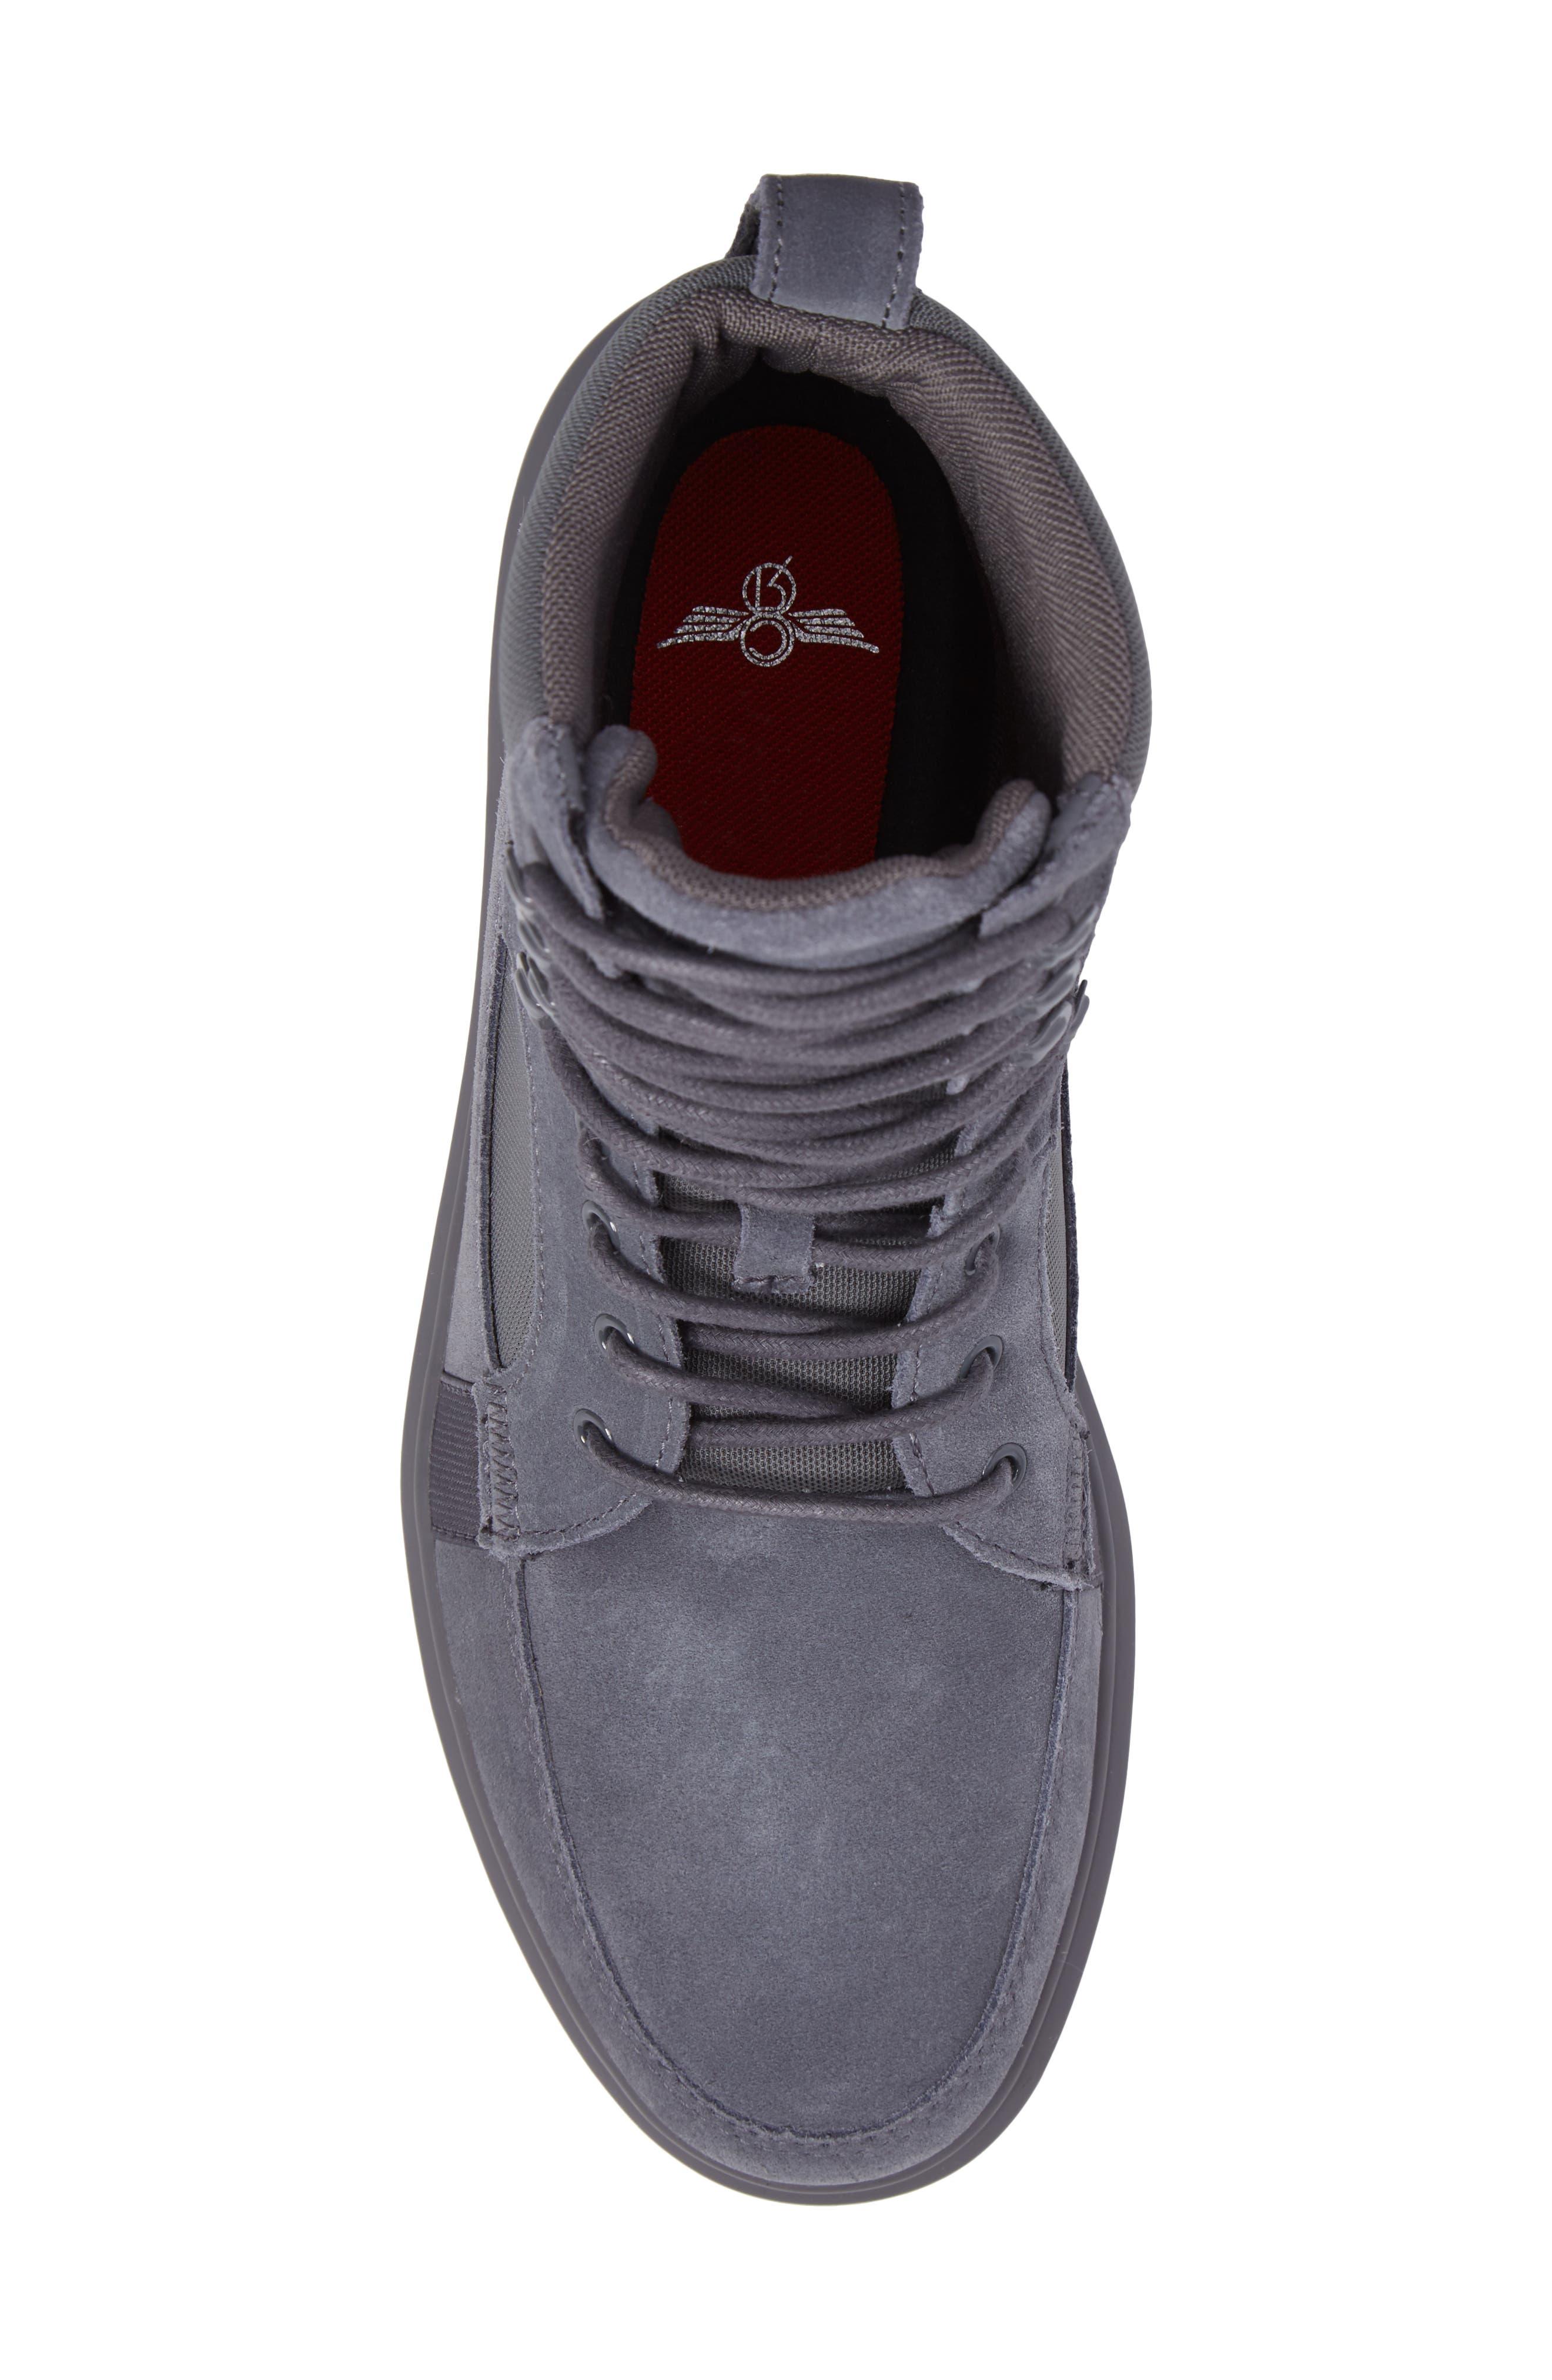 Desimo Sneaker,                             Alternate thumbnail 5, color,                             Smoke Leather